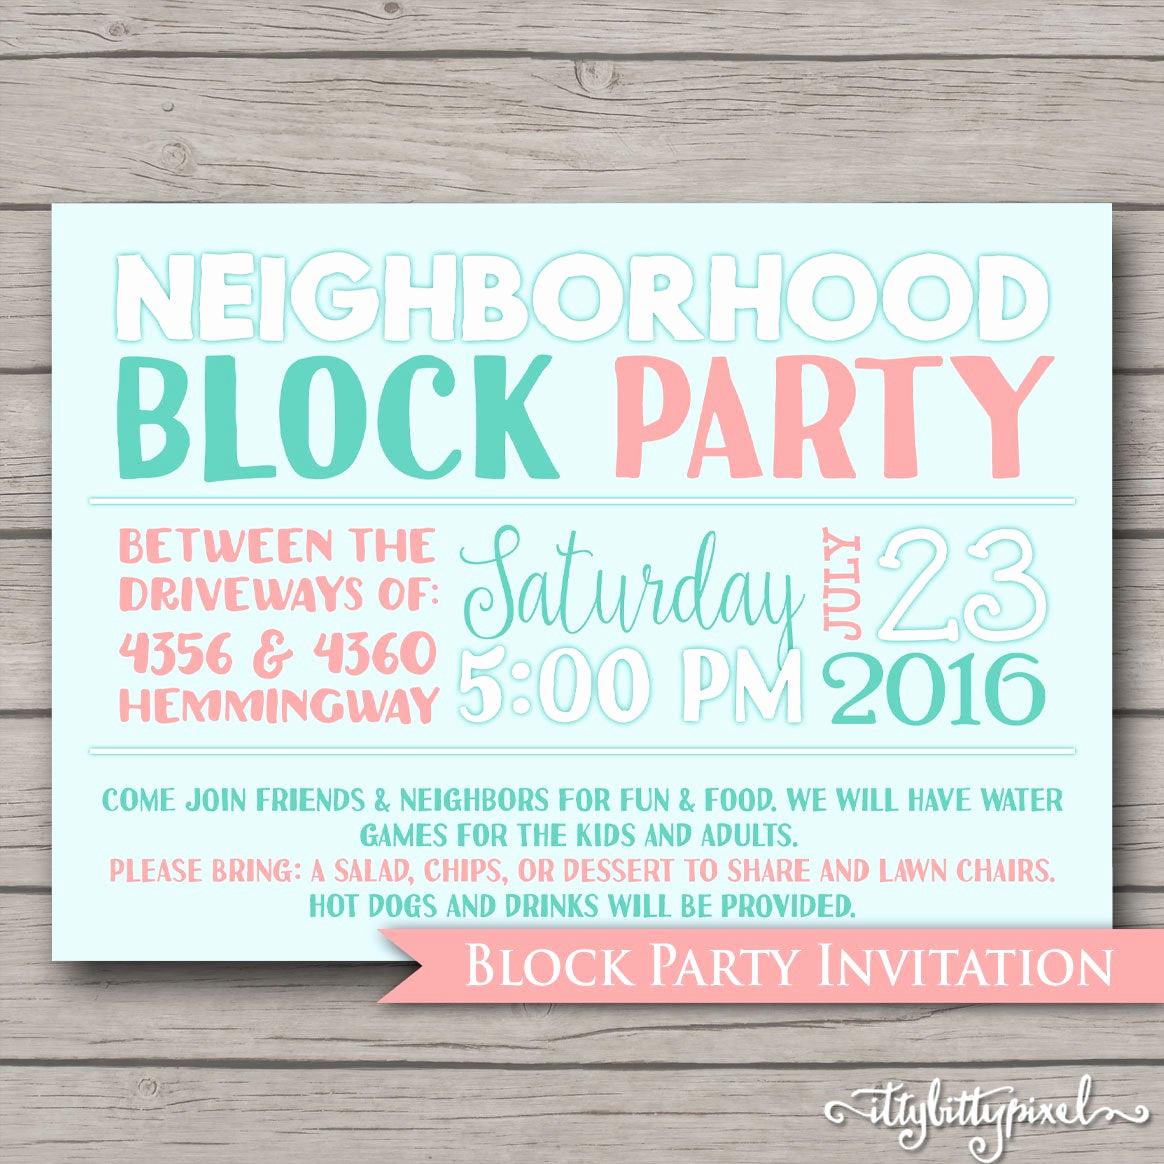 Neighborhood Party Invitation Wording Fresh Neighborhood Block Party Invitation Announcement Invite Card